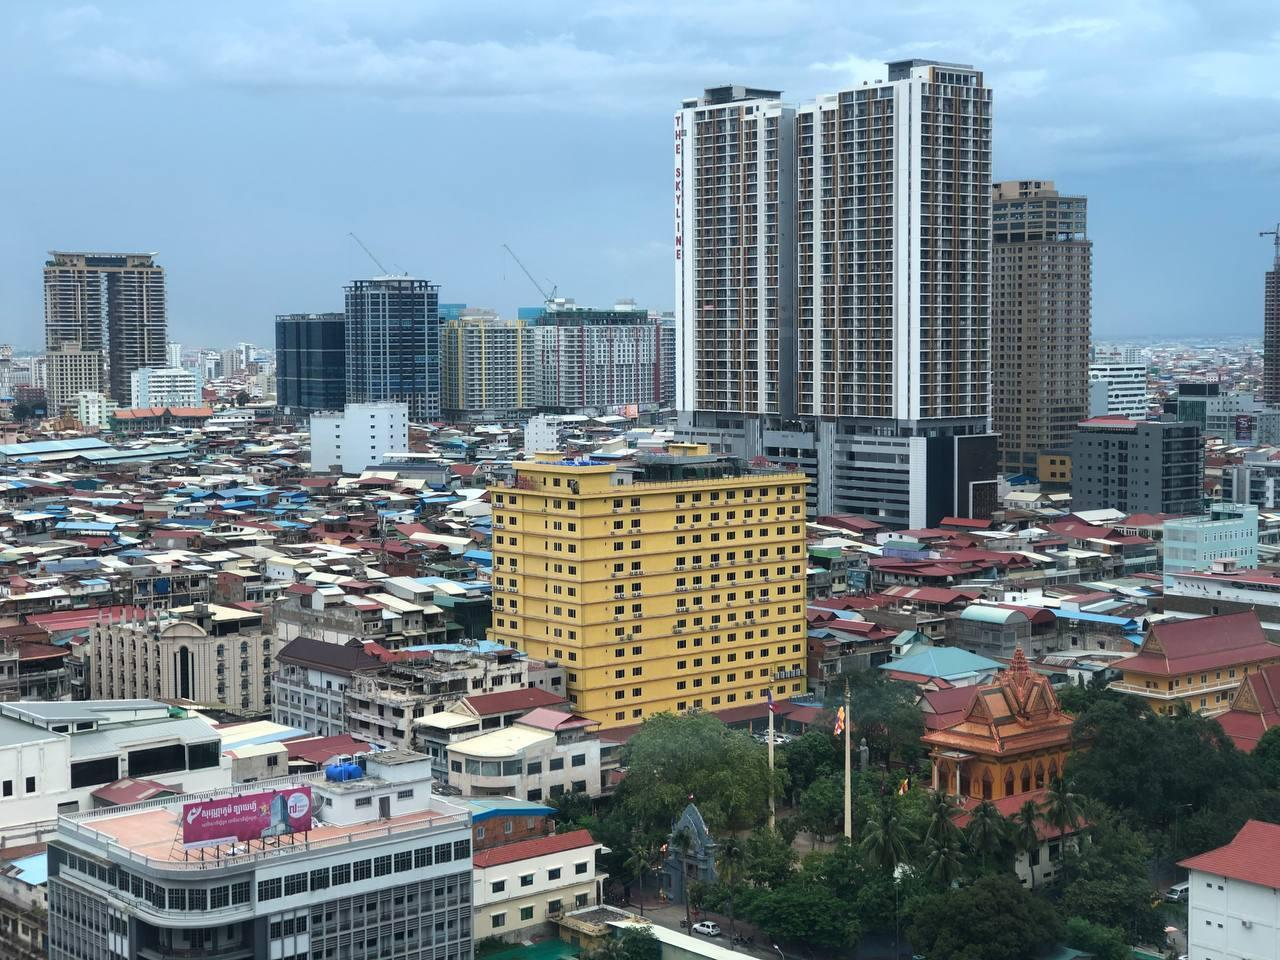 Economic-KIMHONG-11-08-2021 (2)